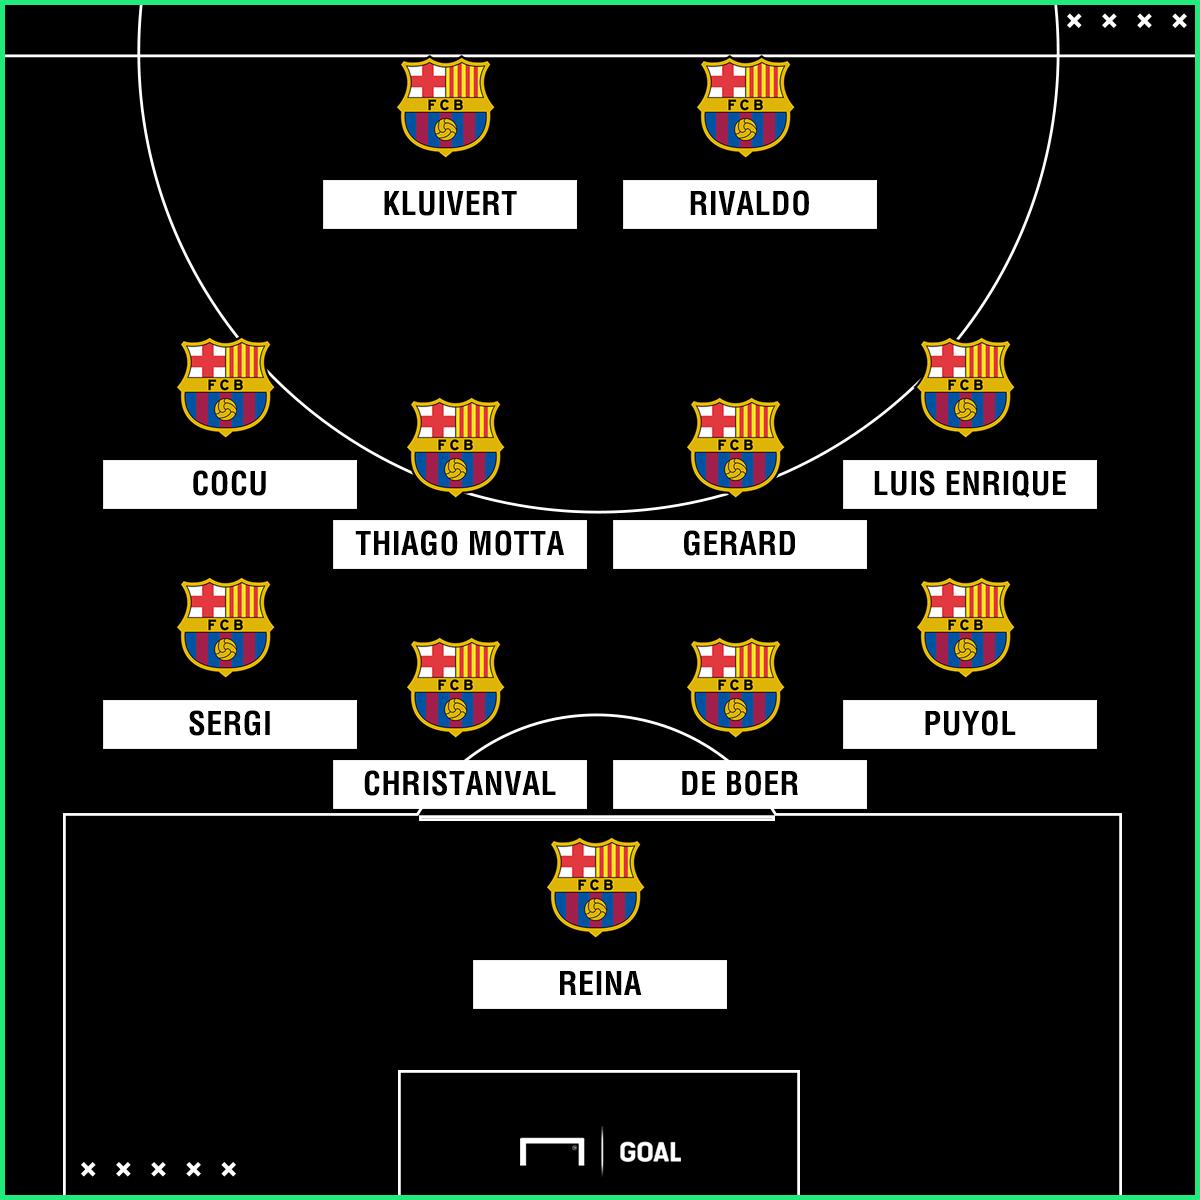 PS Barcellona XI vs. Roma 2002